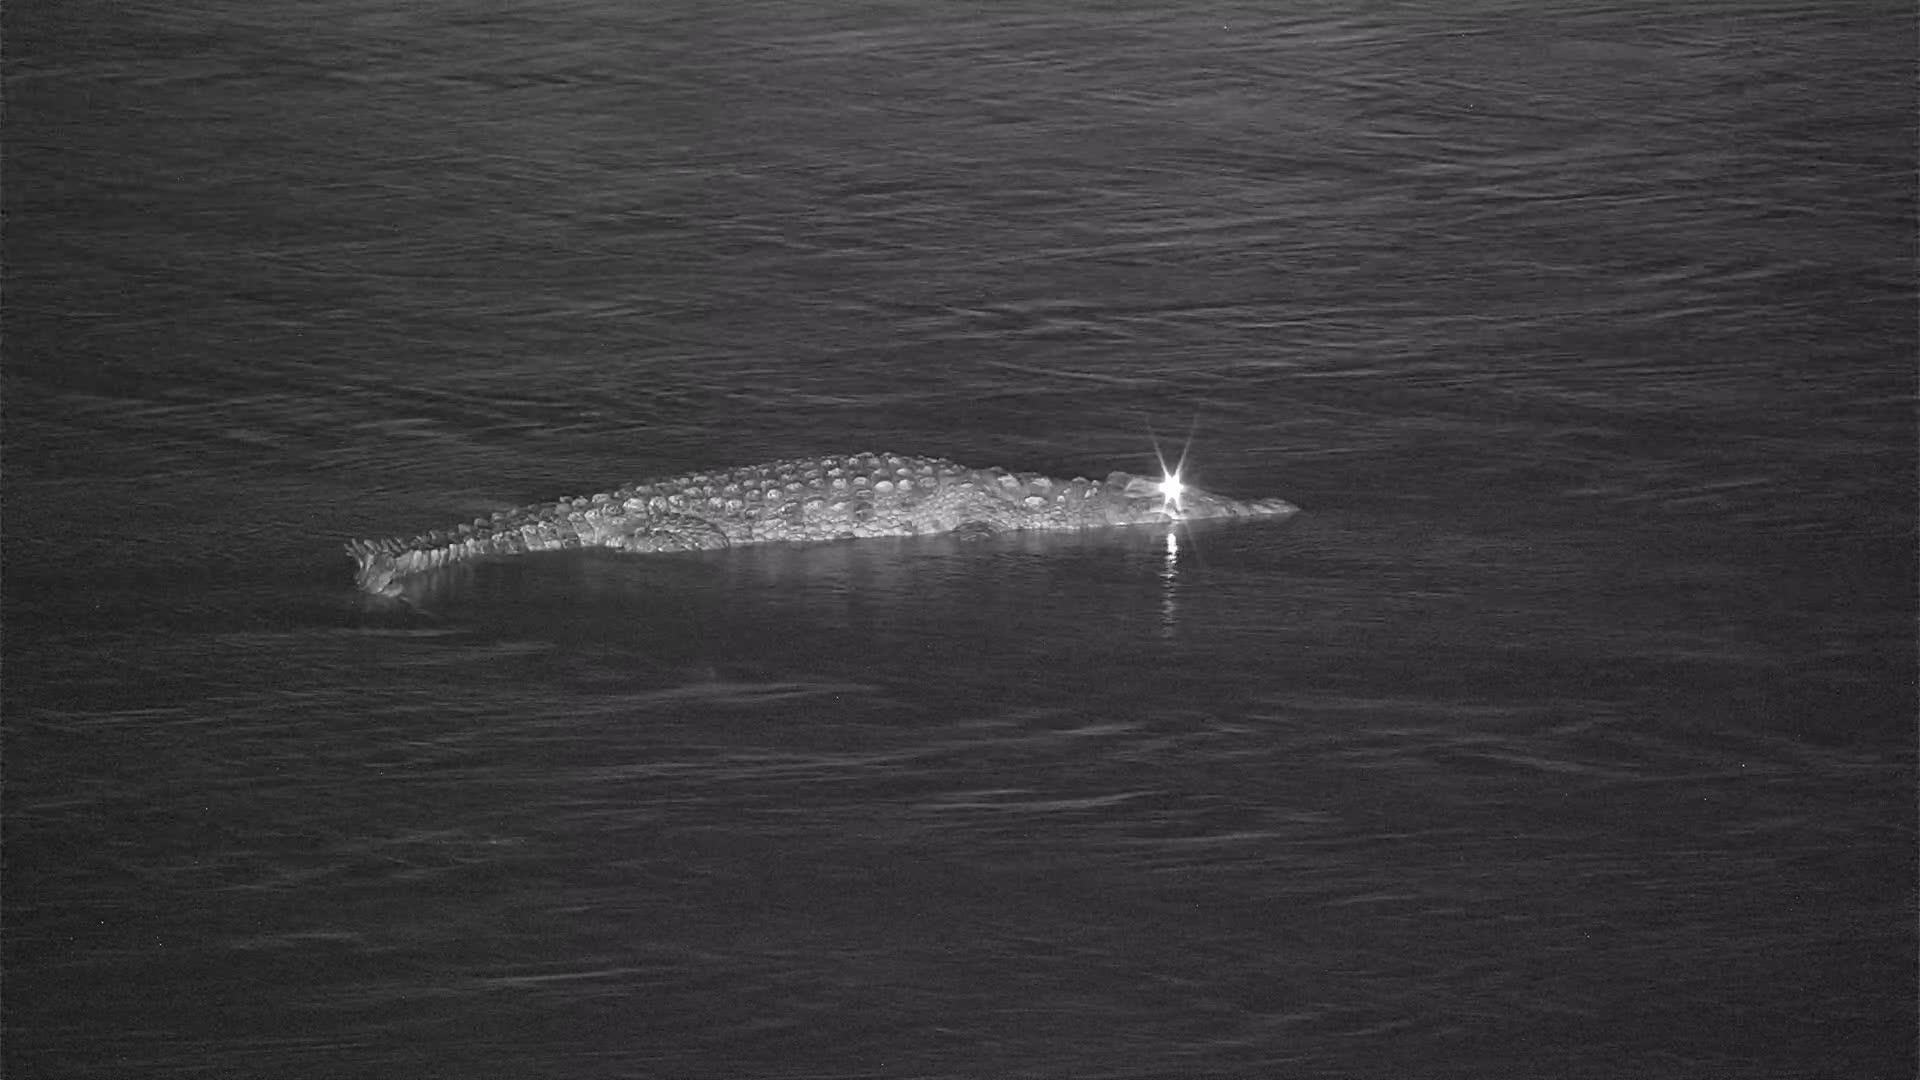 VIDEO:  Crocodile heading down stream